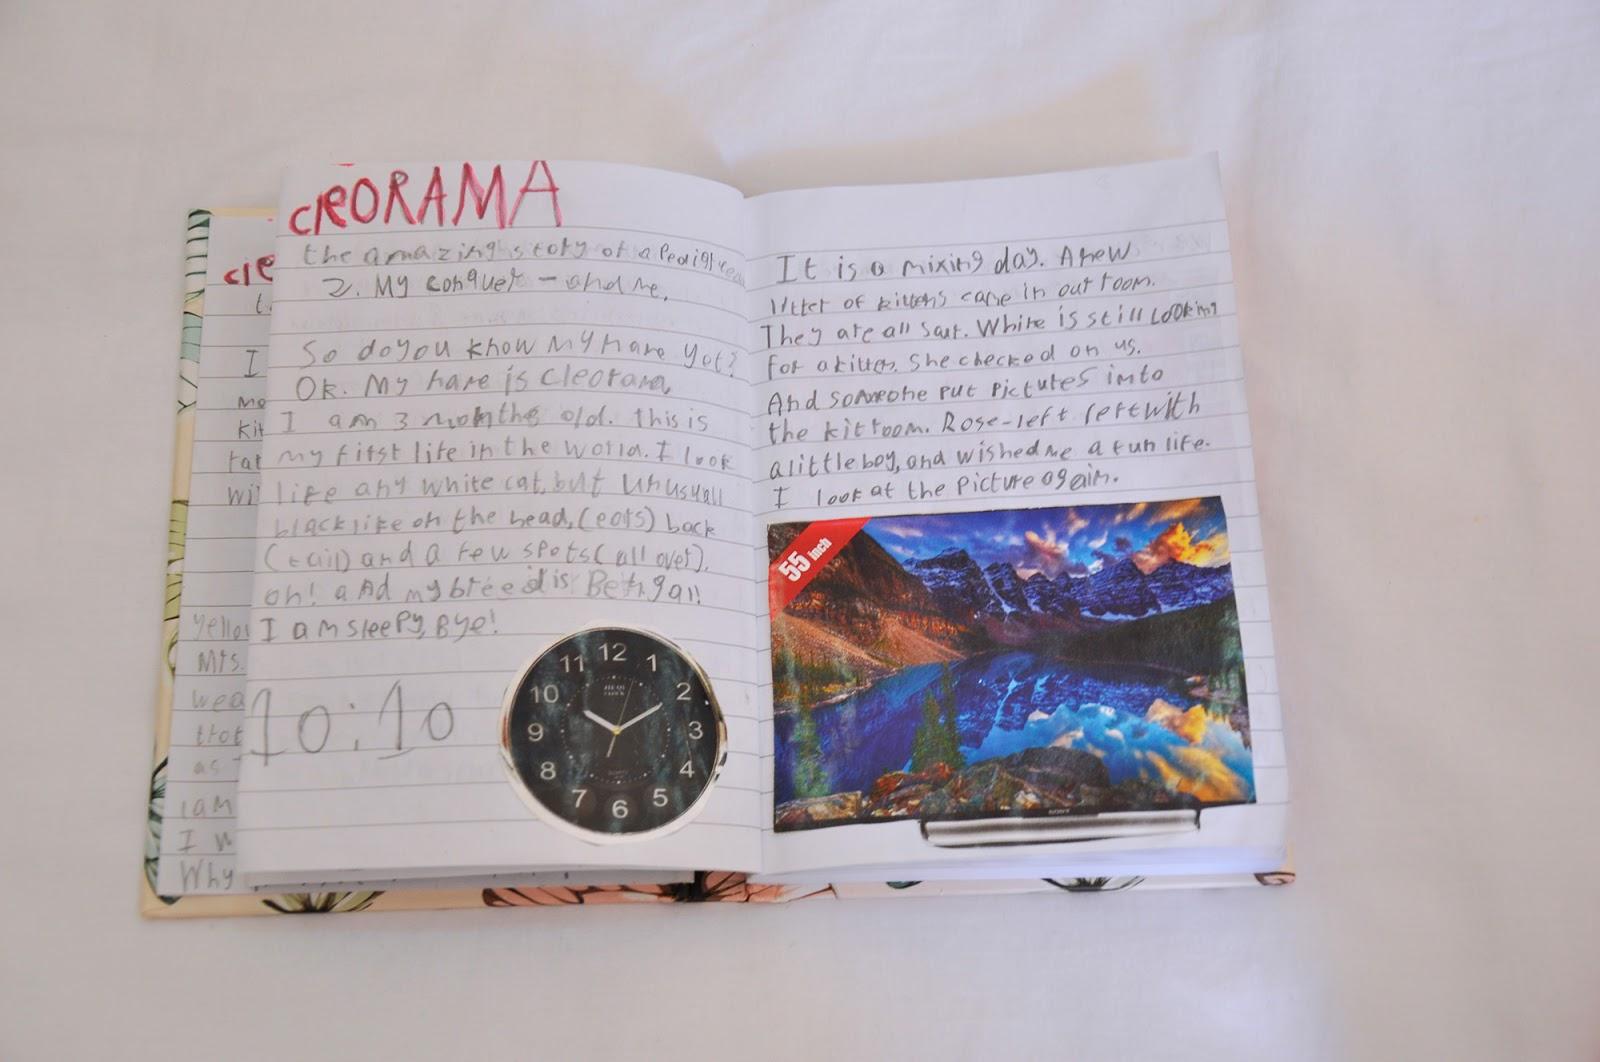 Umm Maimoonah S Journal